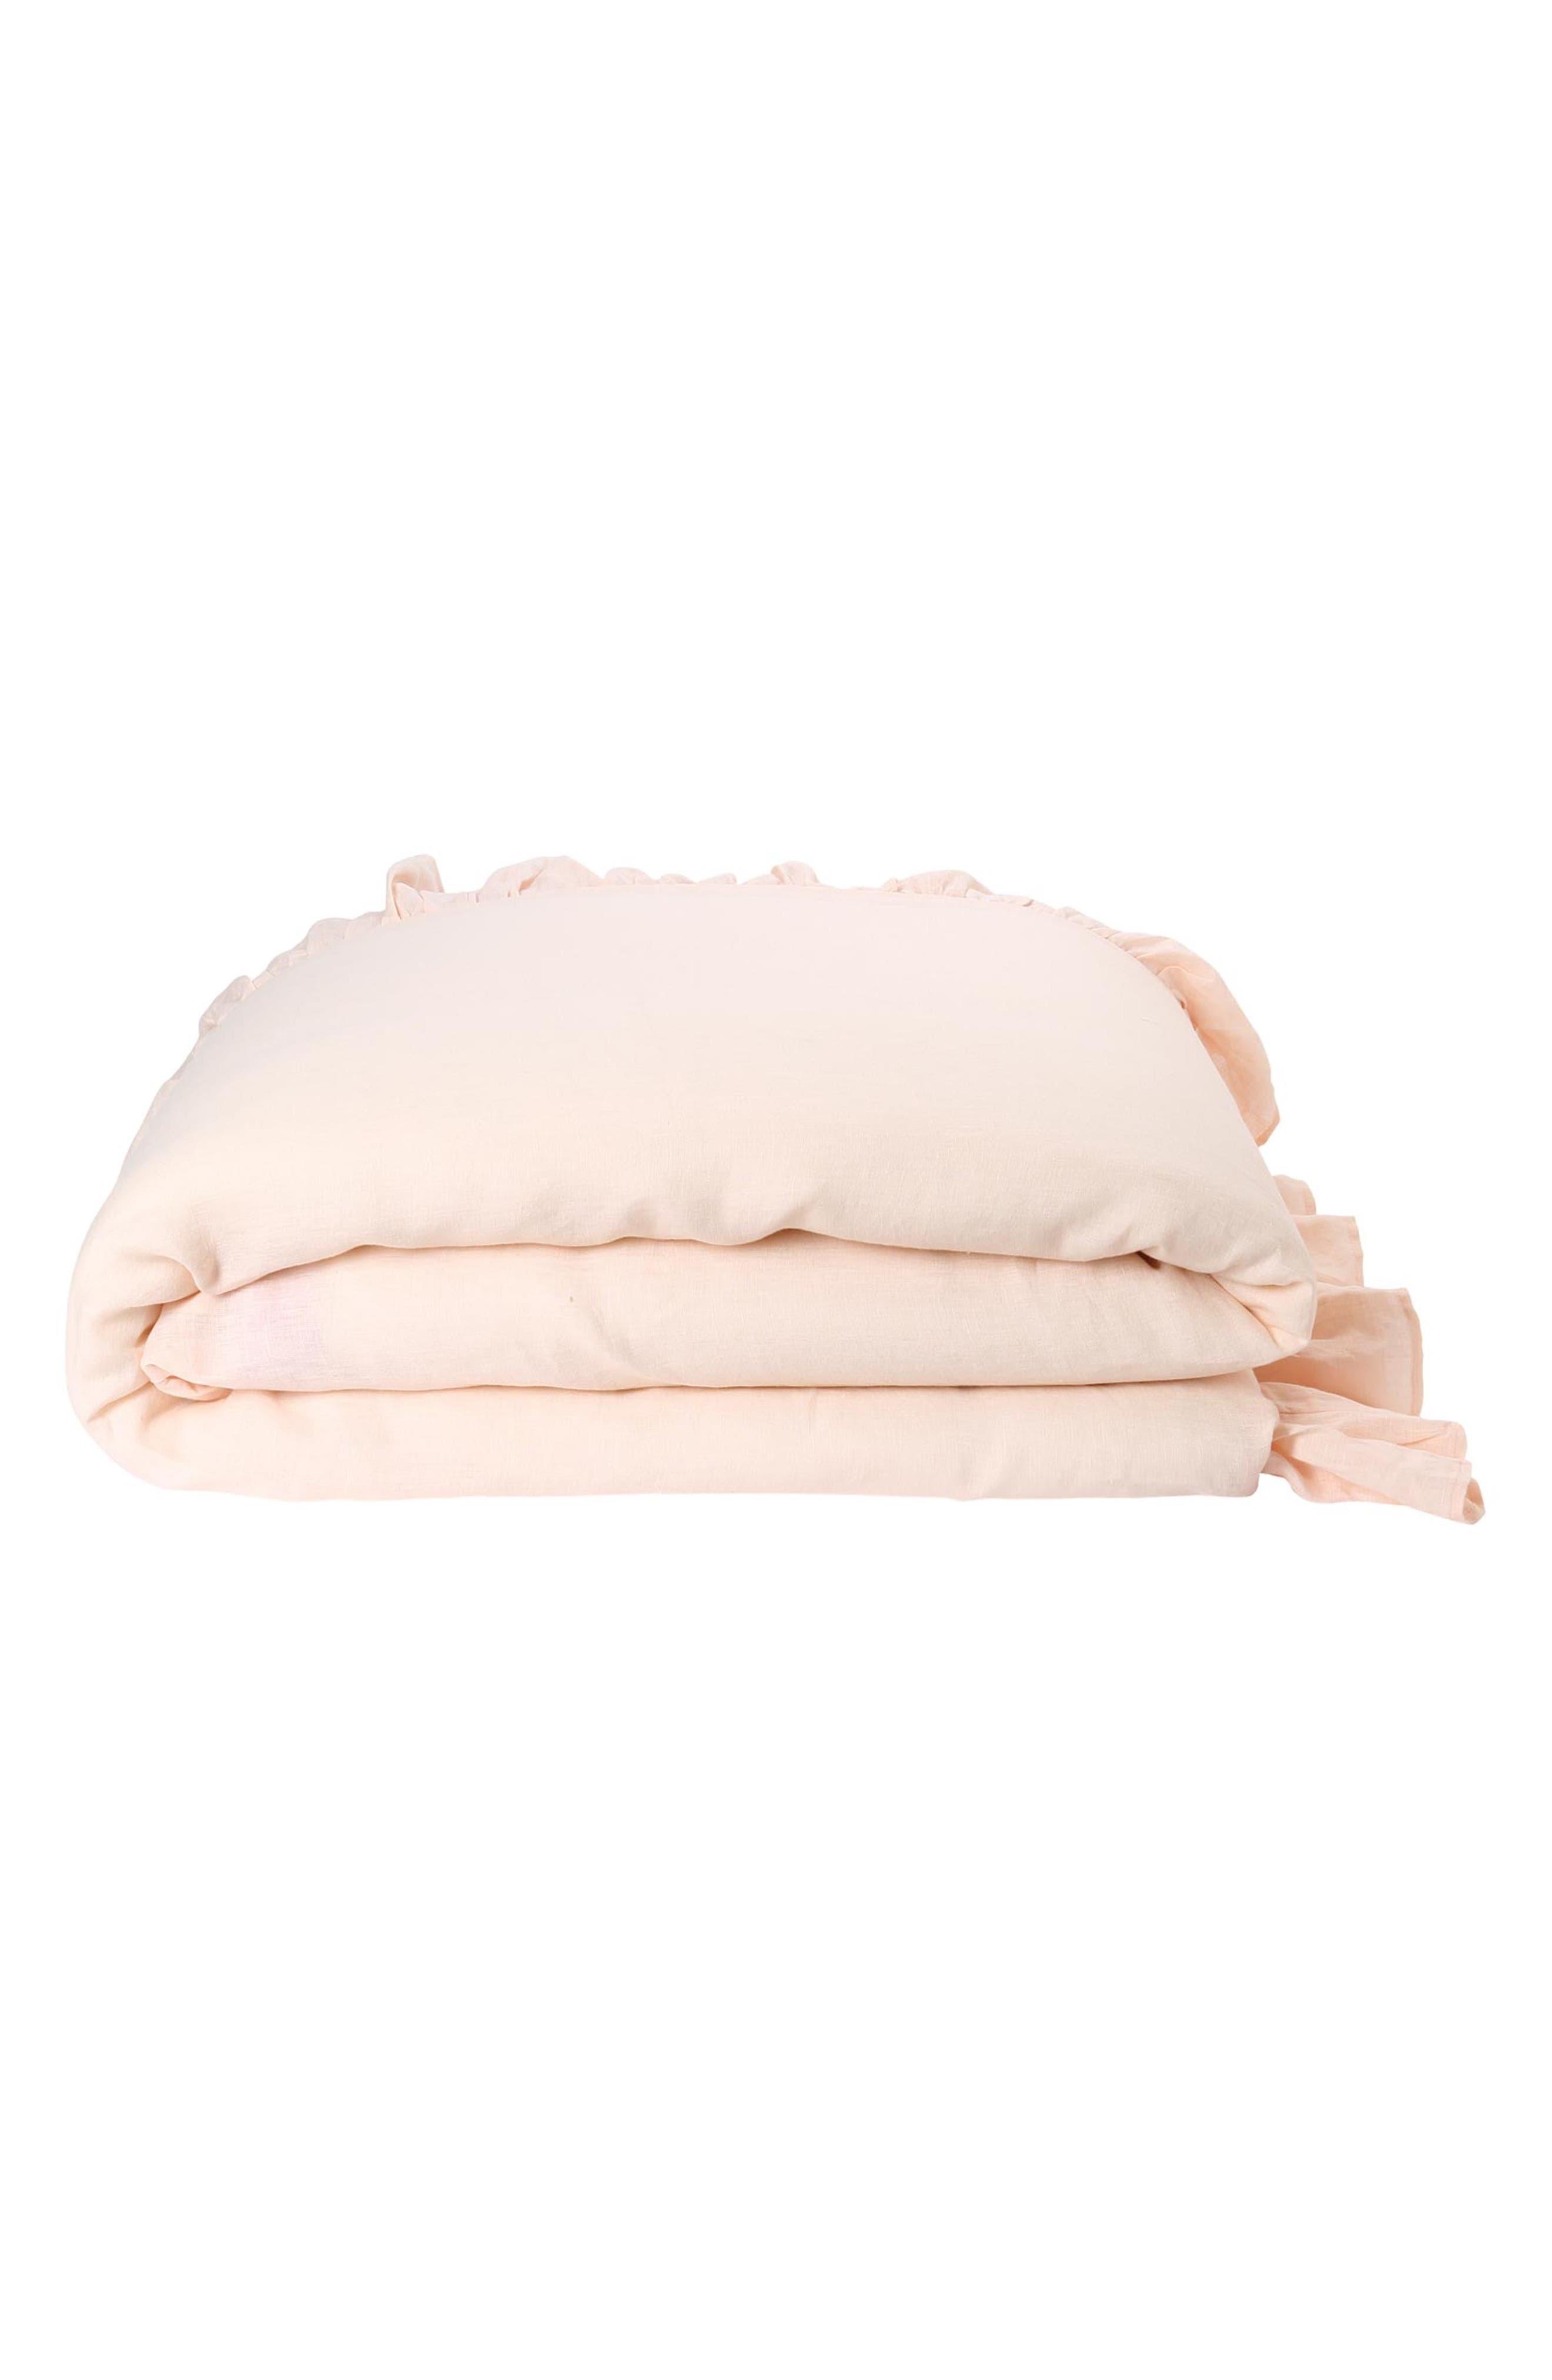 Ruffle Reversible Linen Comforter,                             Alternate thumbnail 2, color,                             900